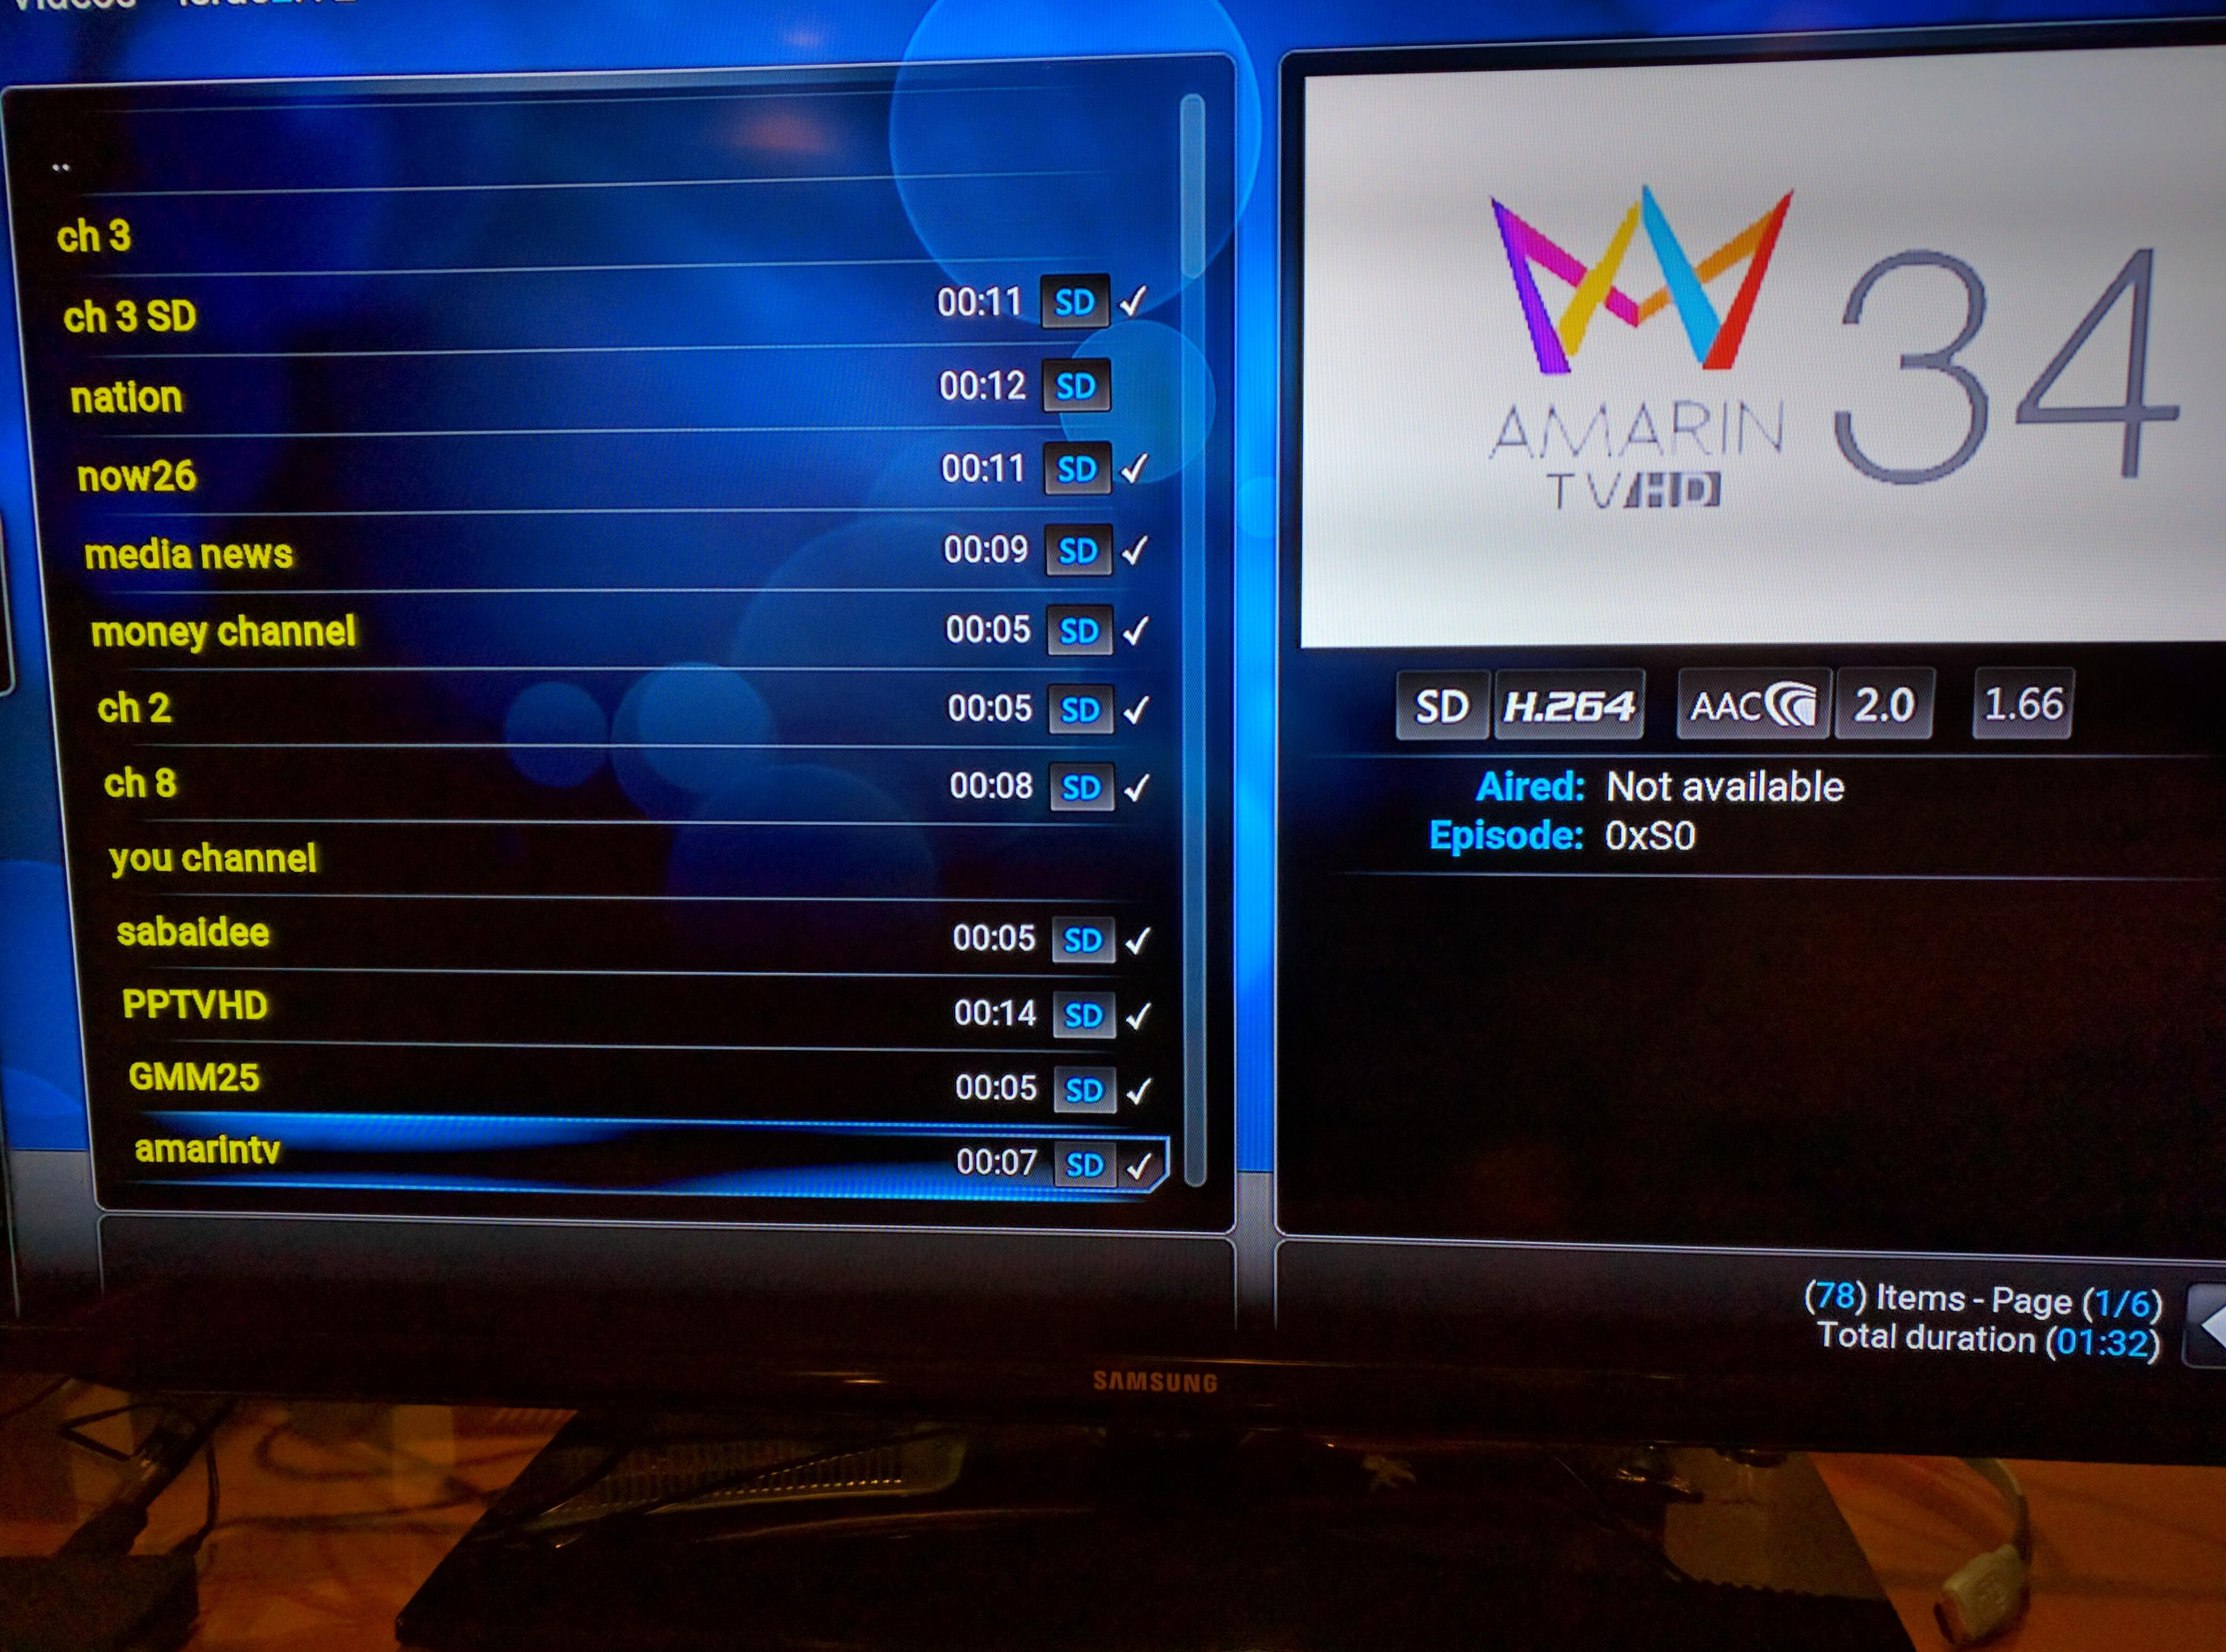 Thai Channels on Kodi Android box - Audio/Visual - Thailand Visa